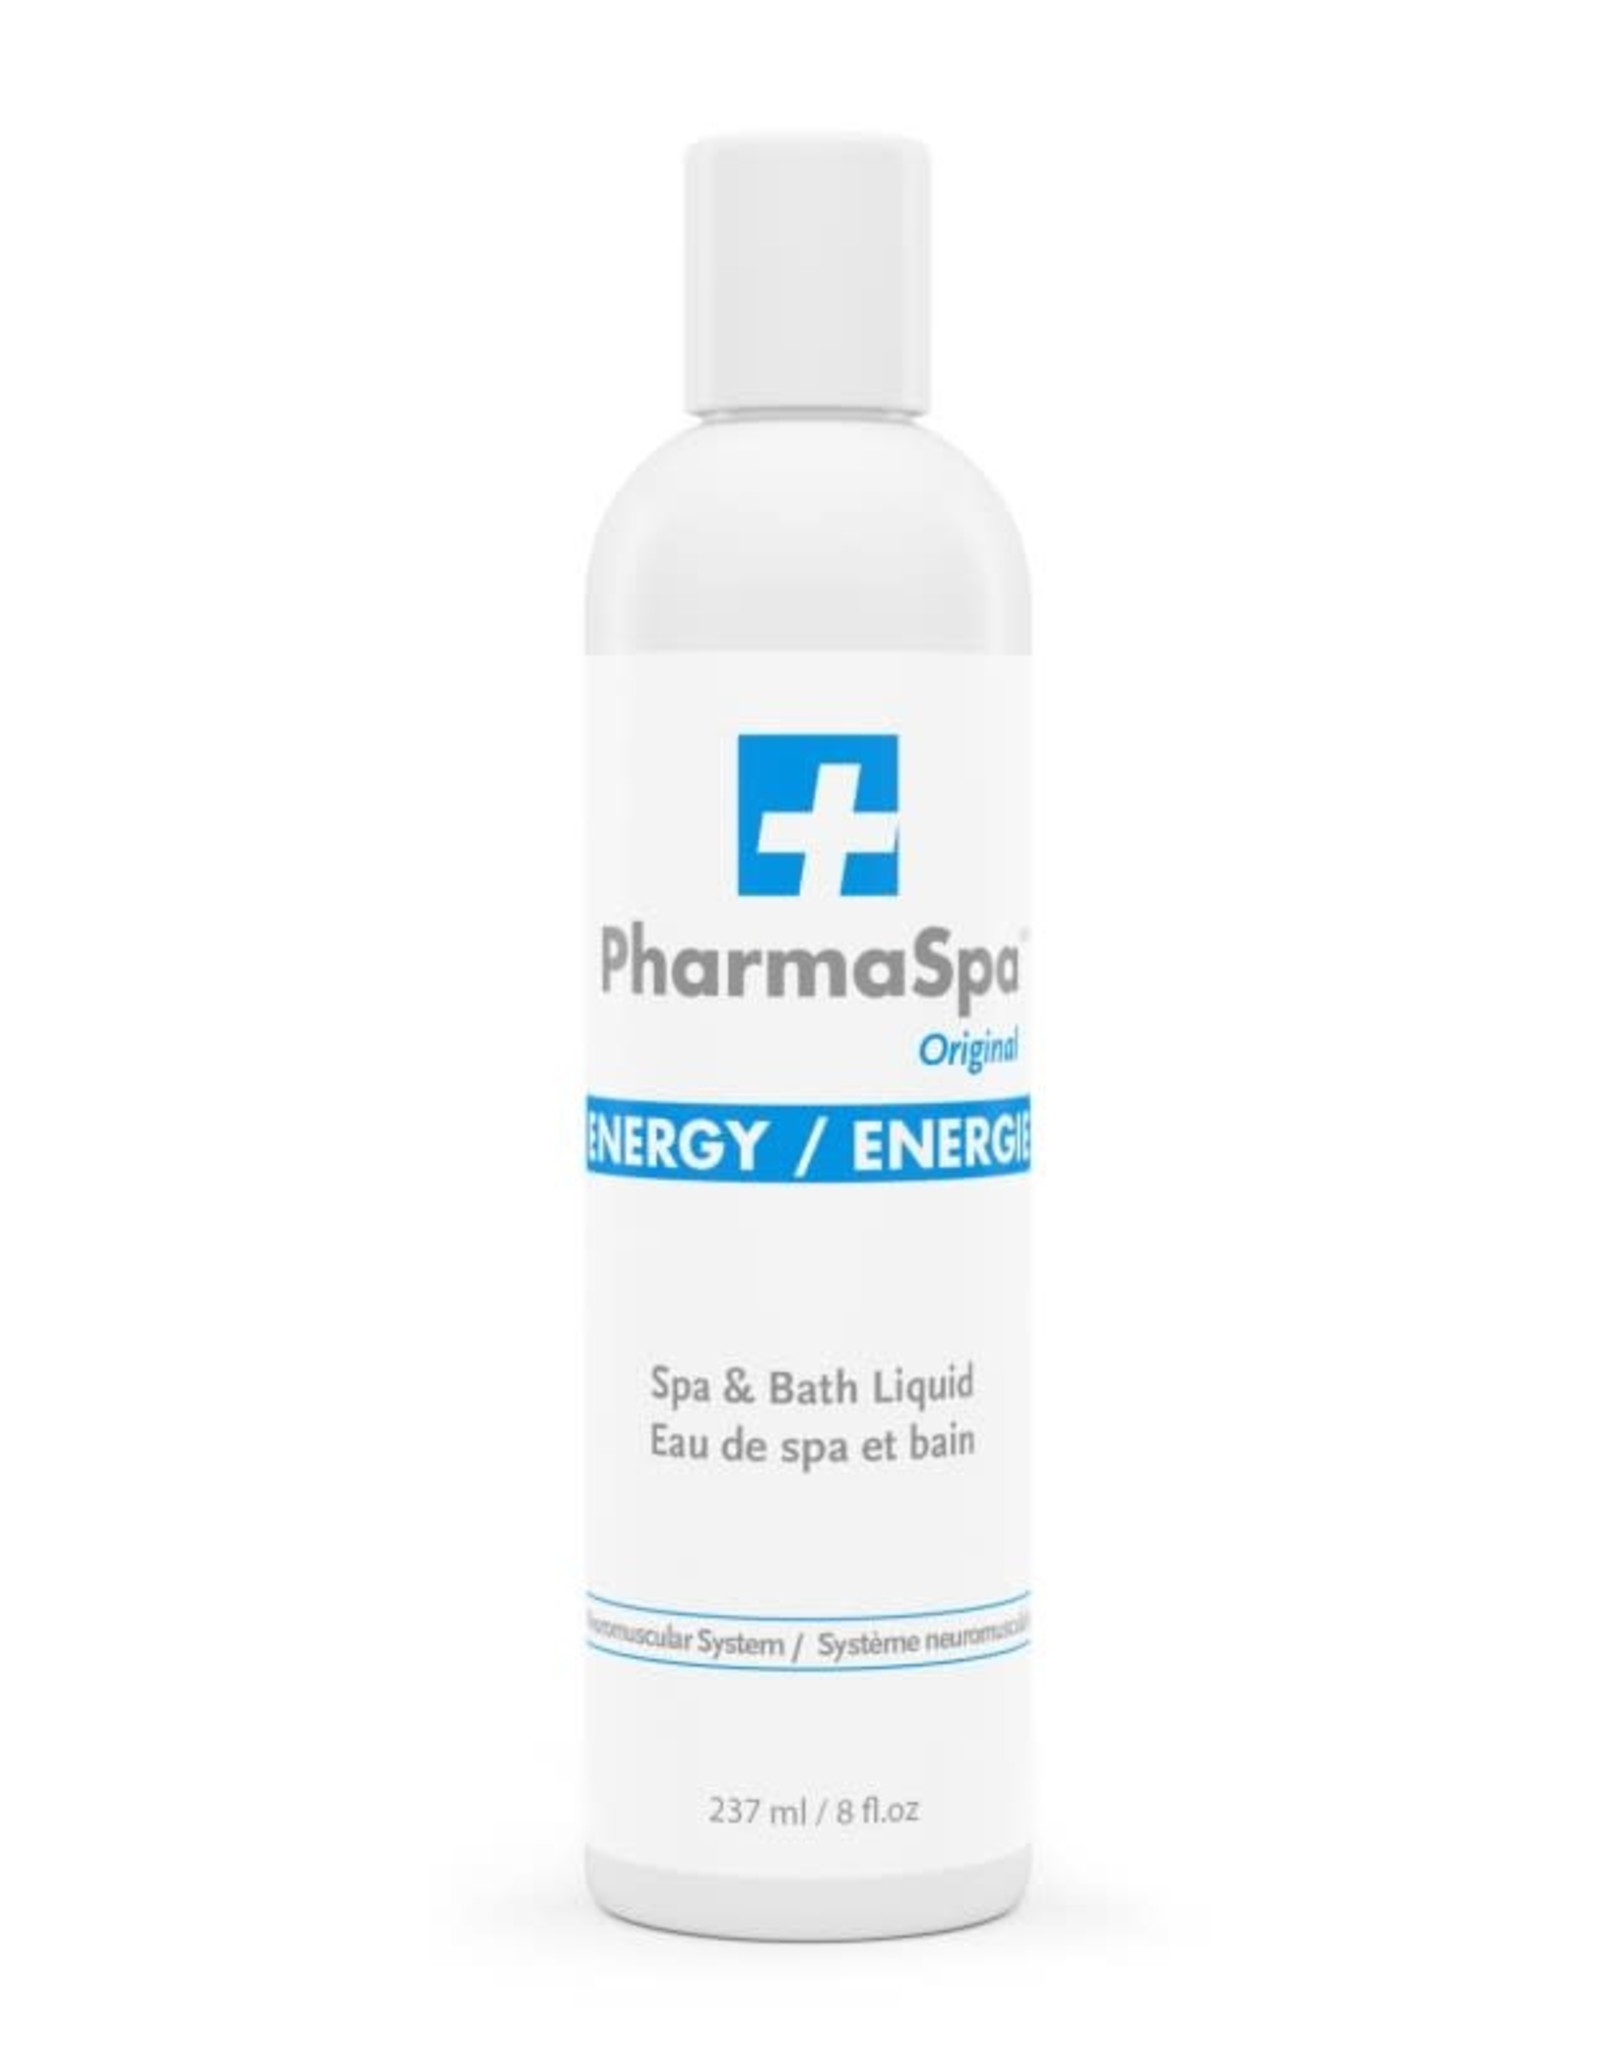 PHARMA SPA Pharma spa fragrances Energy